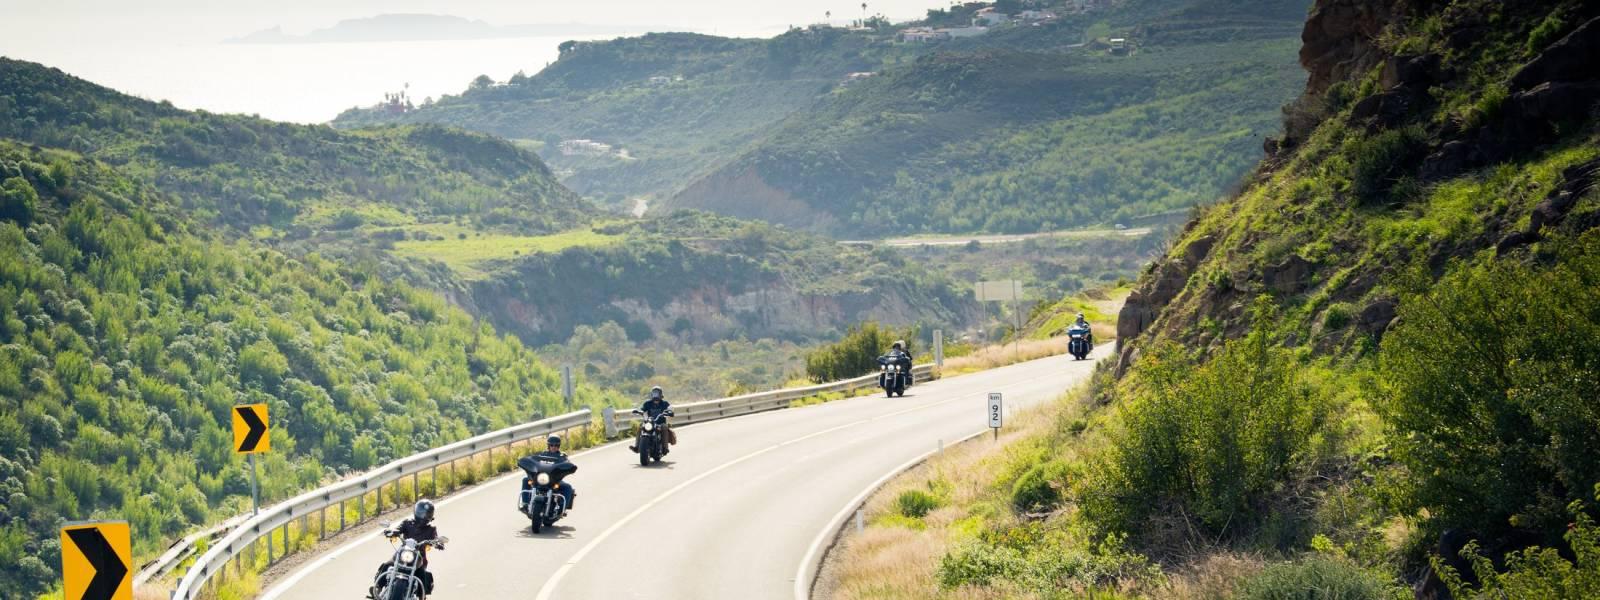 Eaglerider motorcycles in California